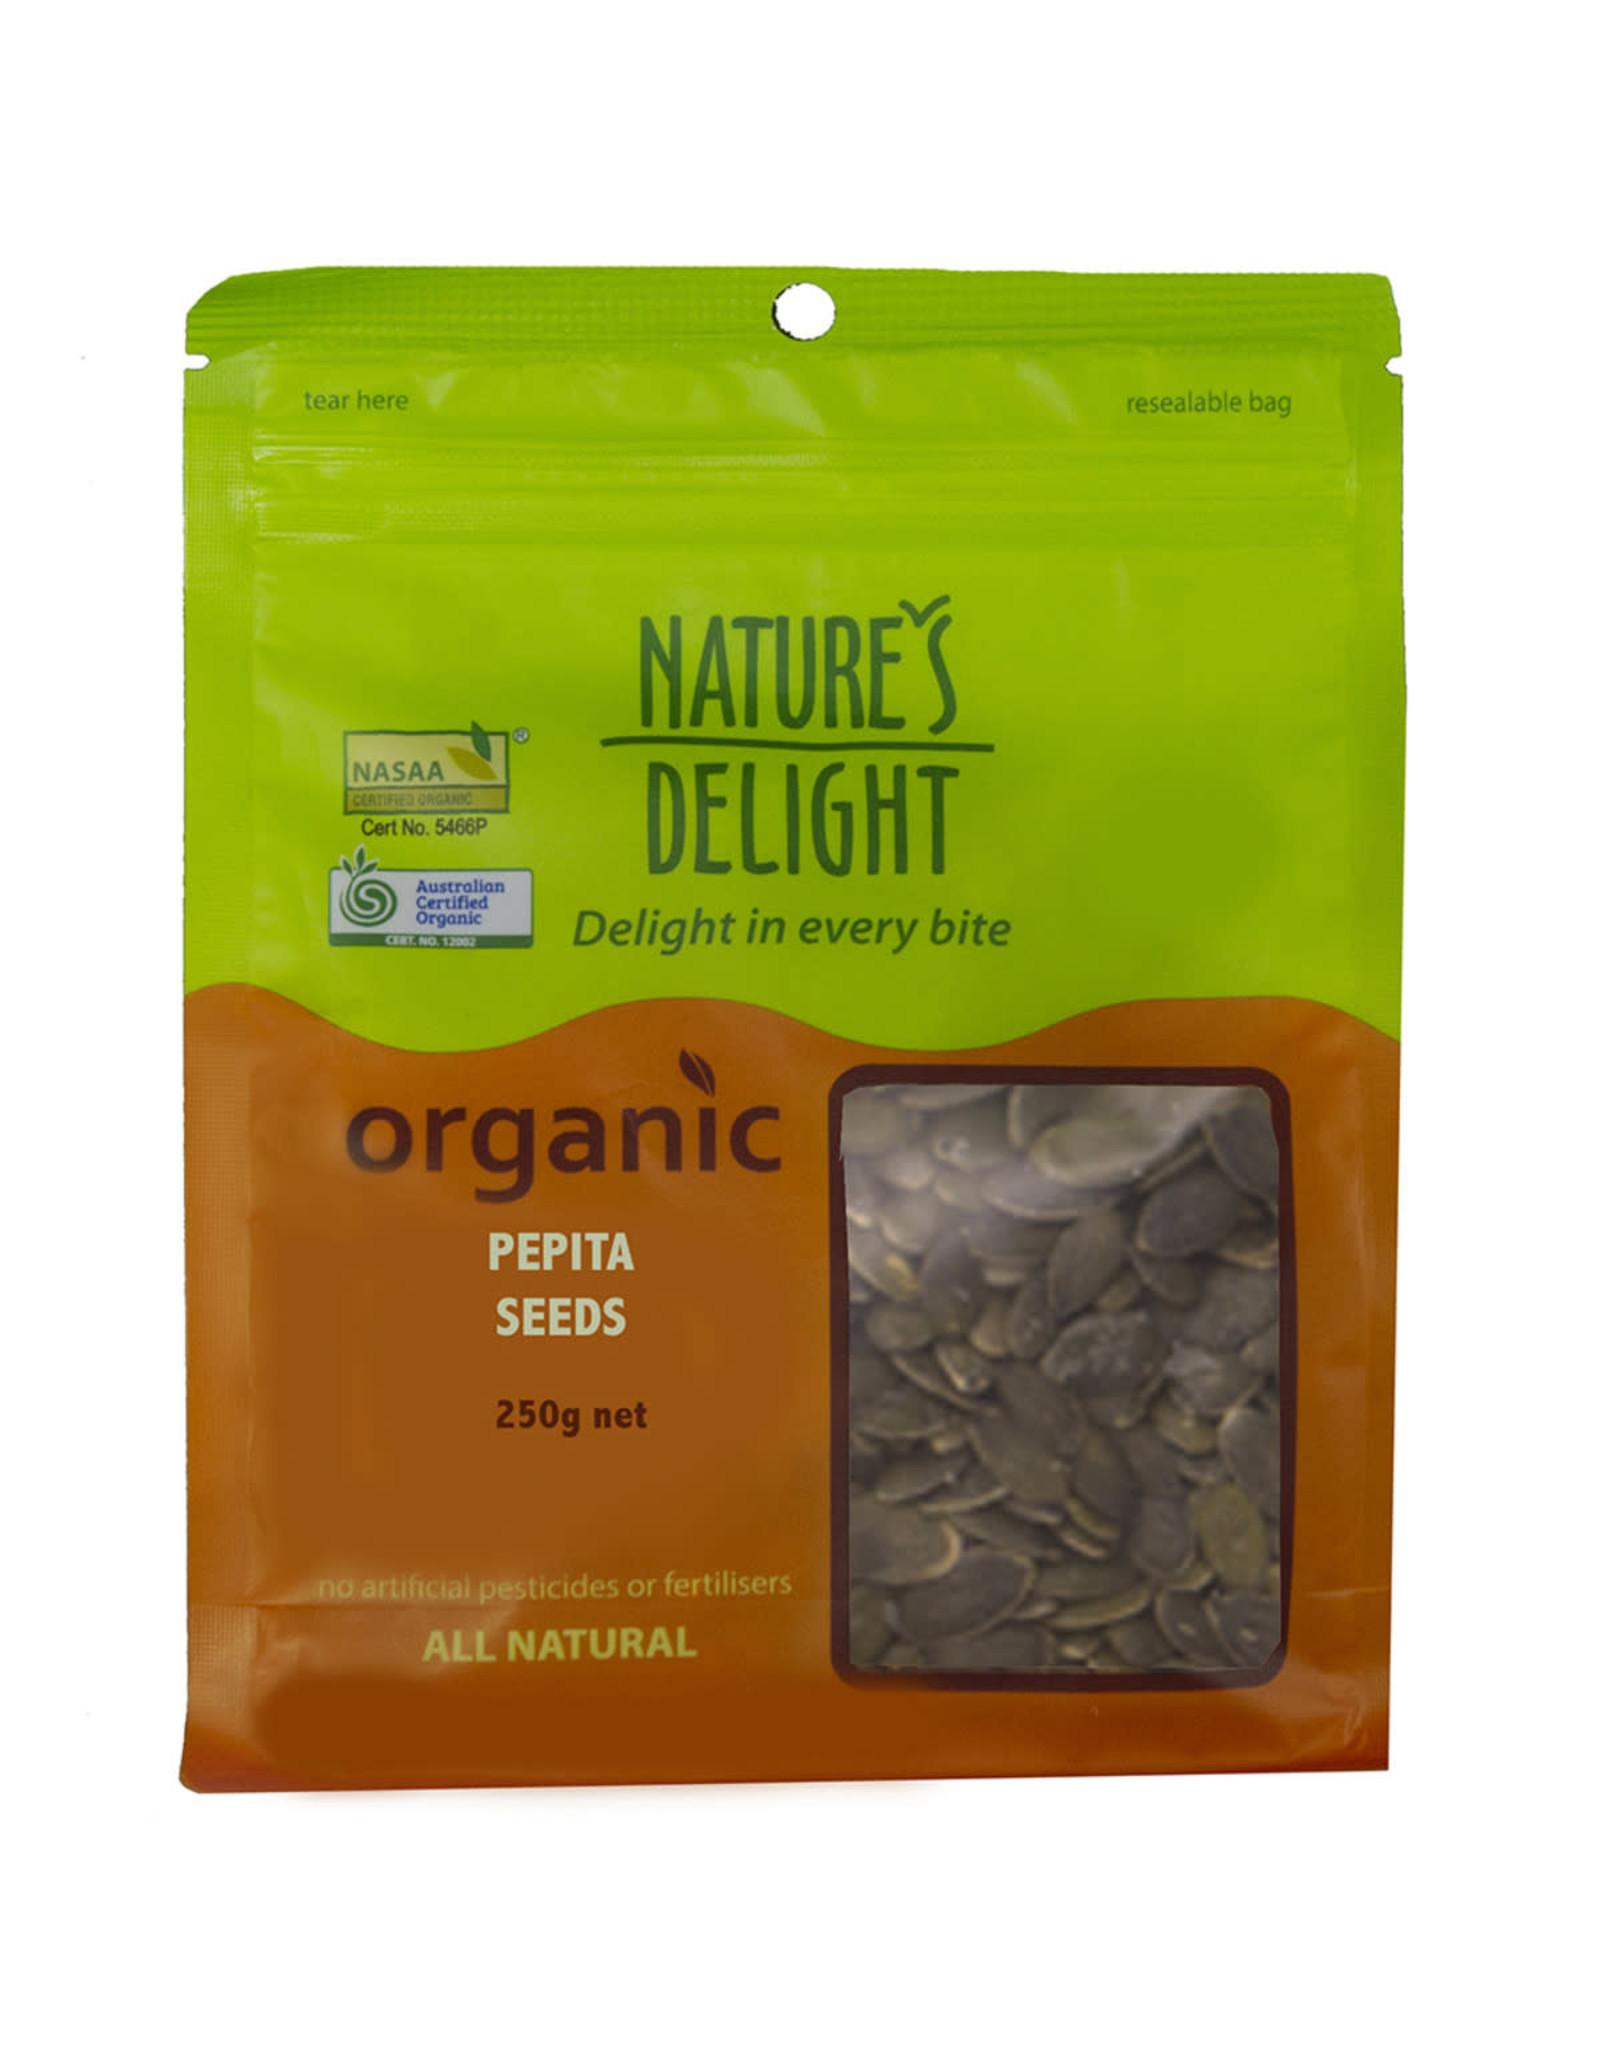 Nature's Delight Organic Pepita Seeds 250g